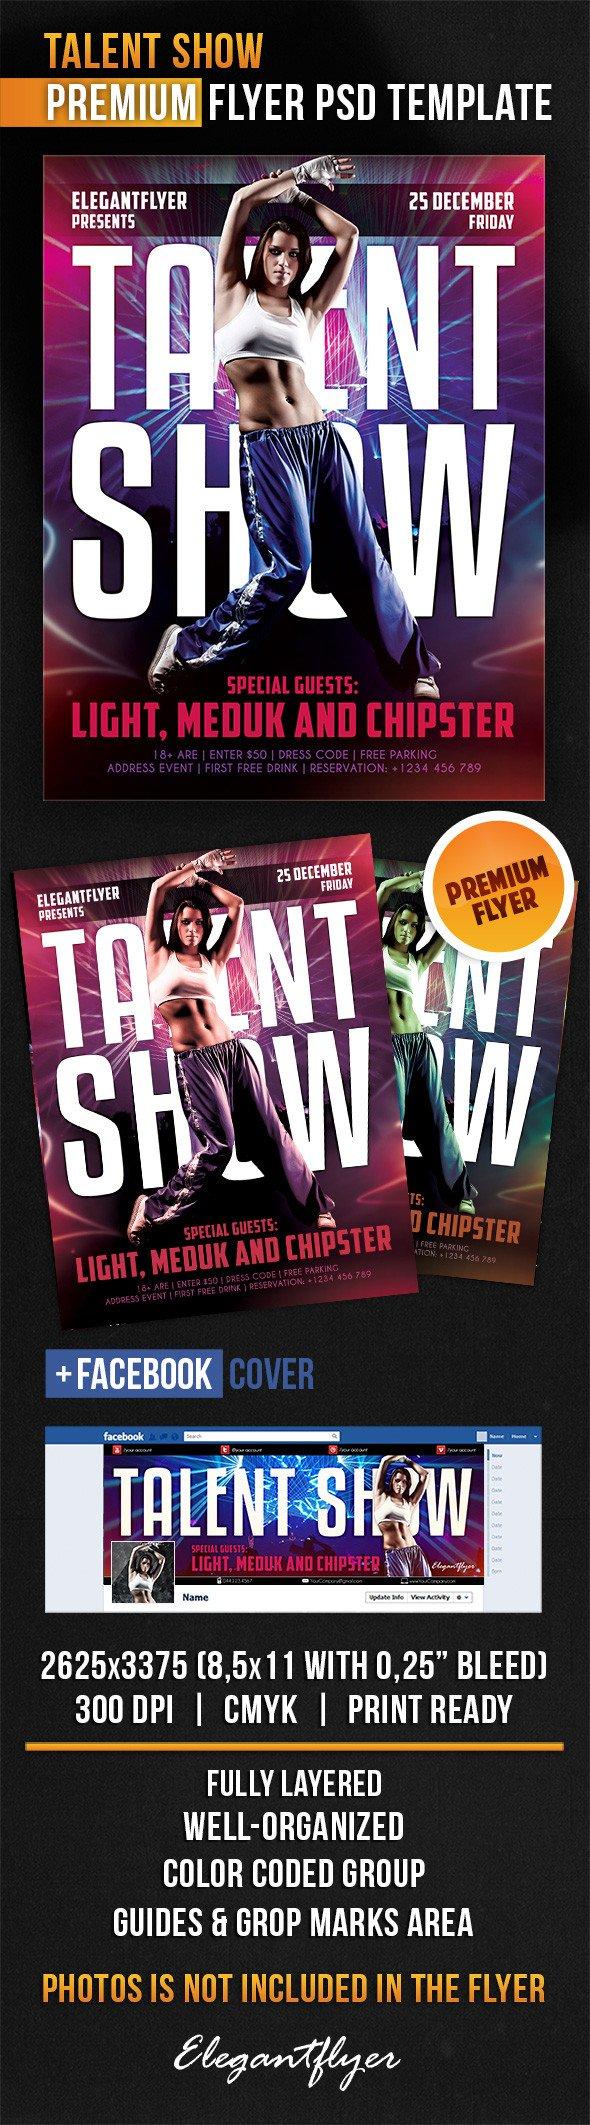 Talent Show Flyer Template Talent Show – Flyer Psd Template – by Elegantflyer